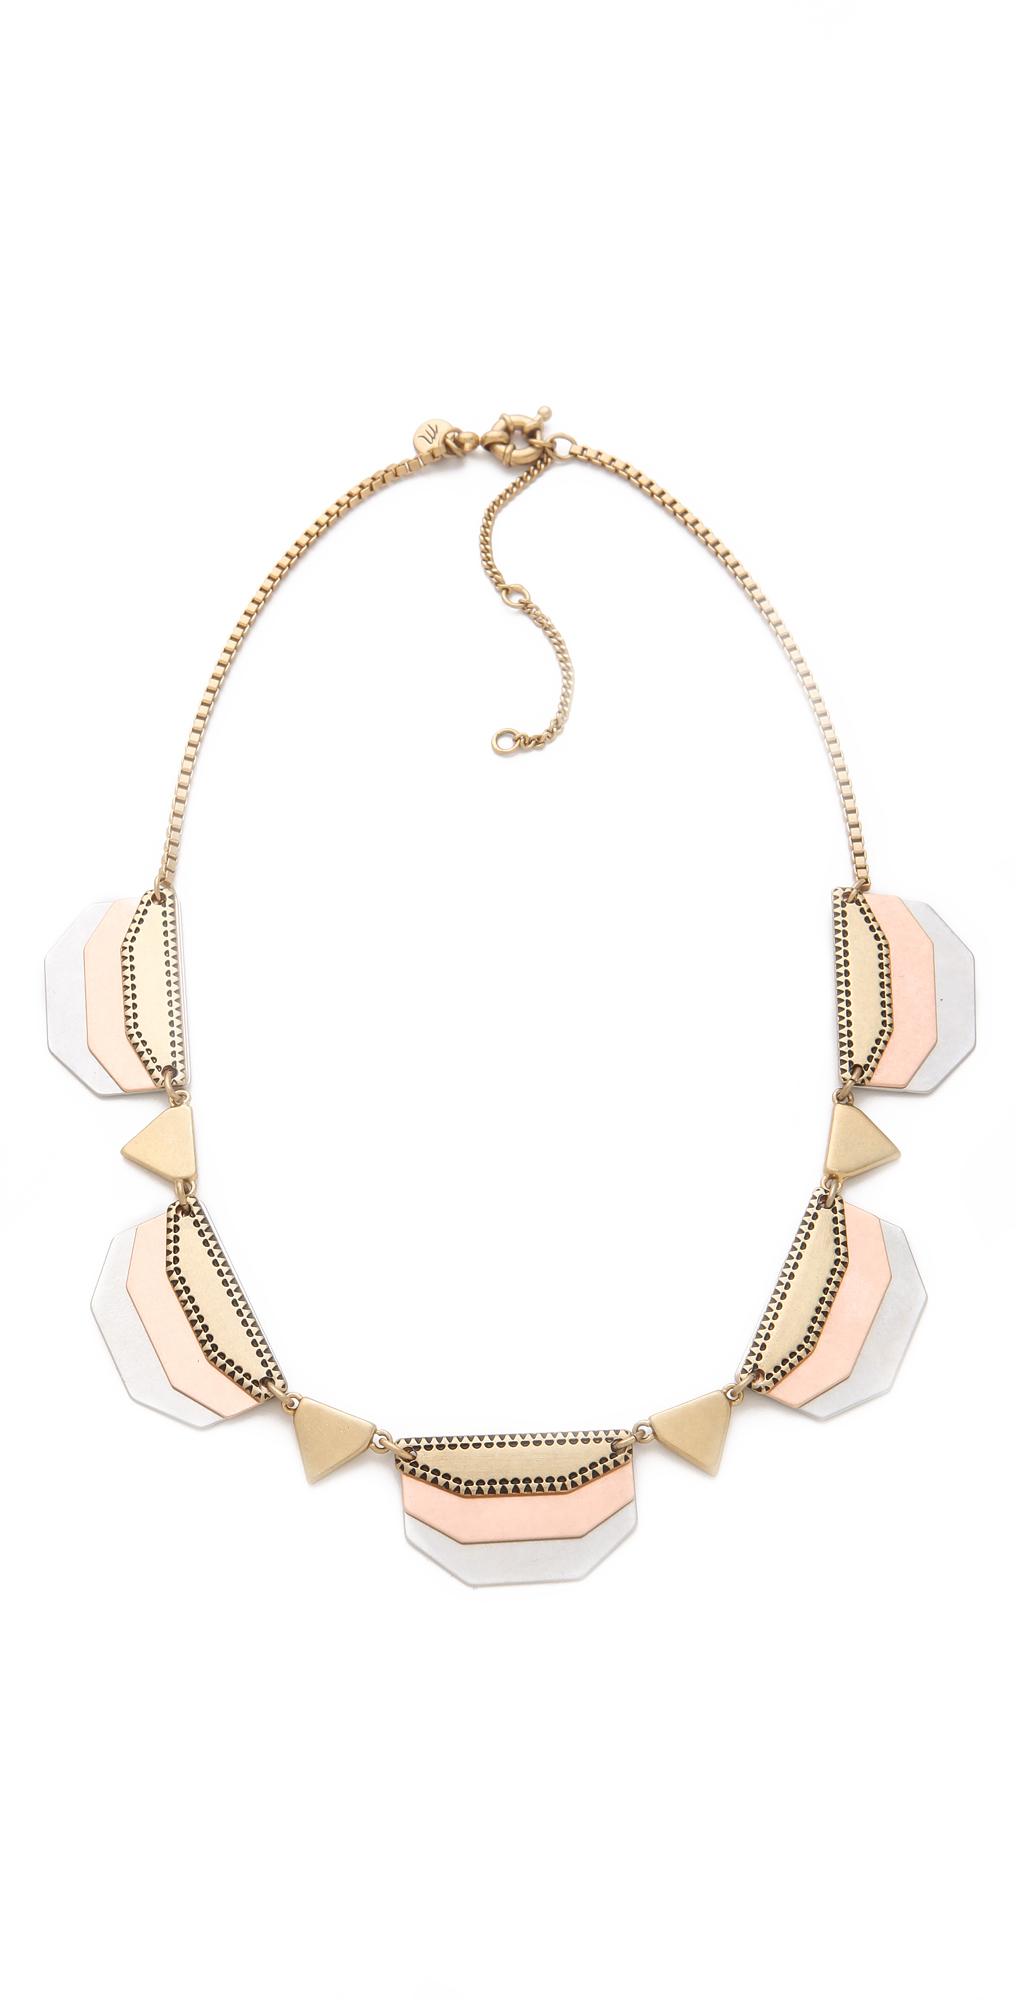 Madewell Metalcraft Necklace